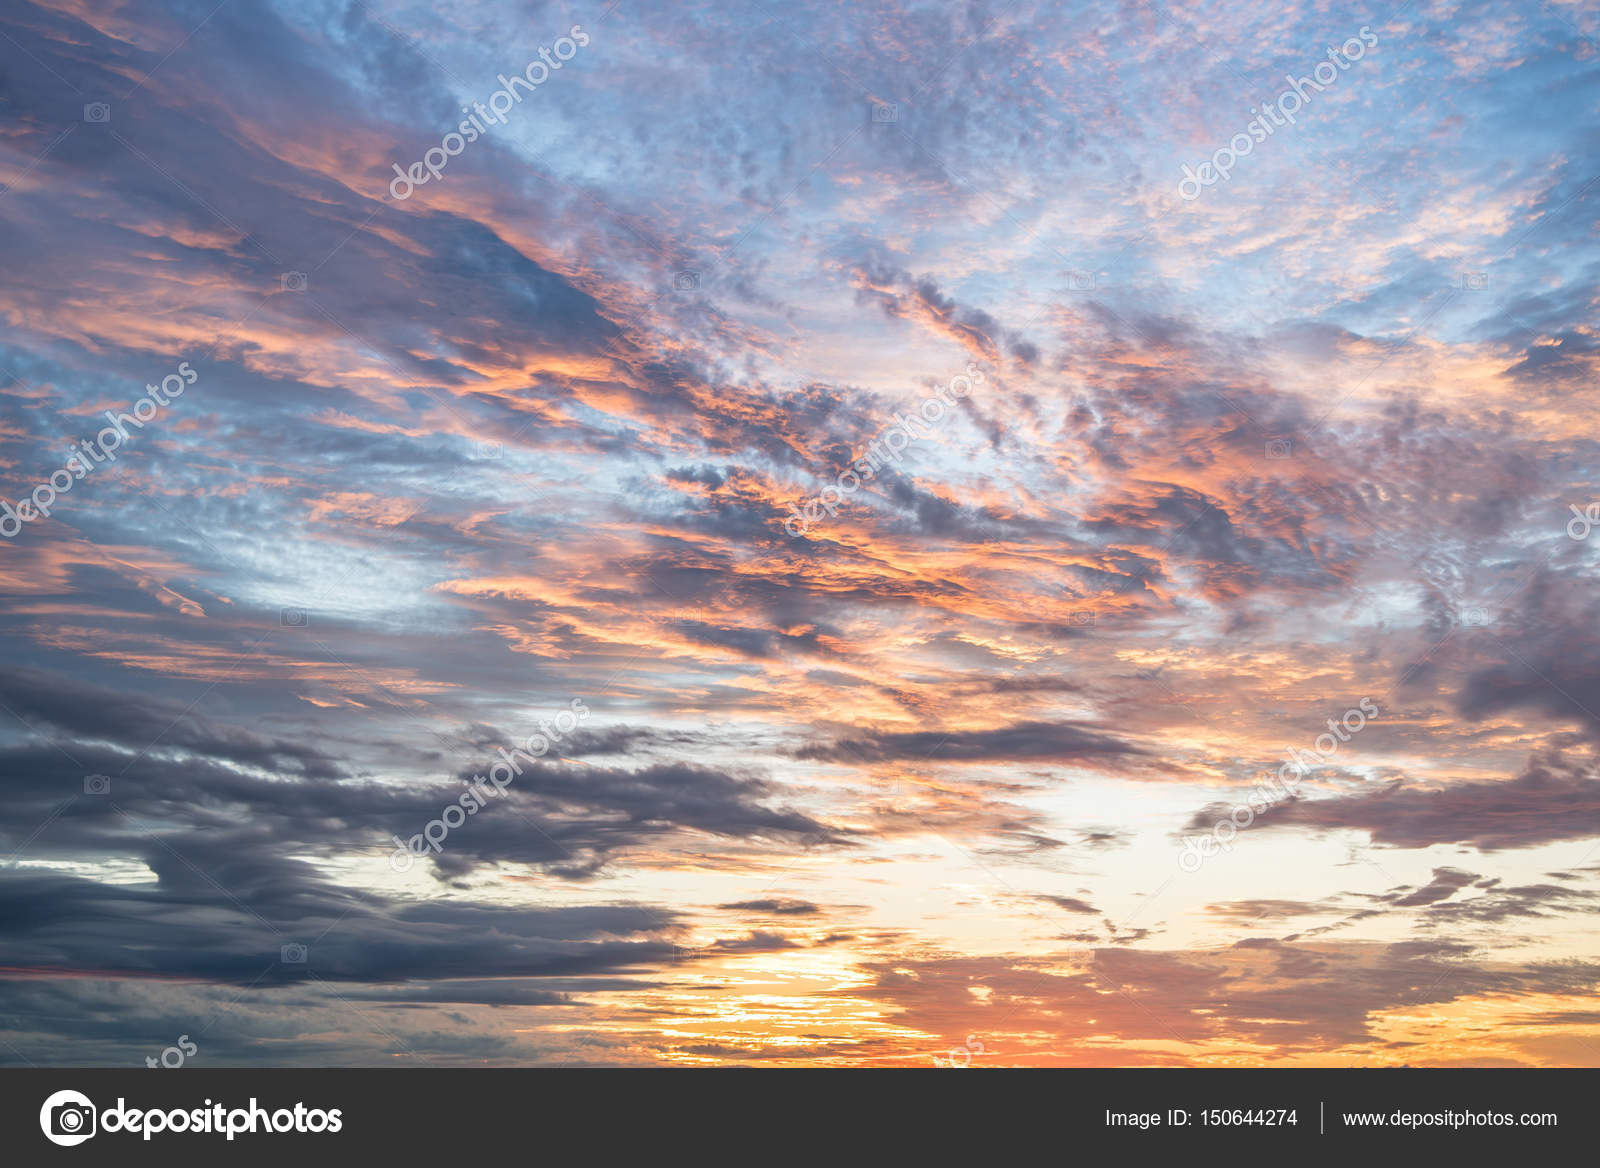 beautiful sunset sky and clouds background stock photo c zephyr18 150644274 https depositphotos com 150644274 stock photo beautiful sunset sky and clouds html